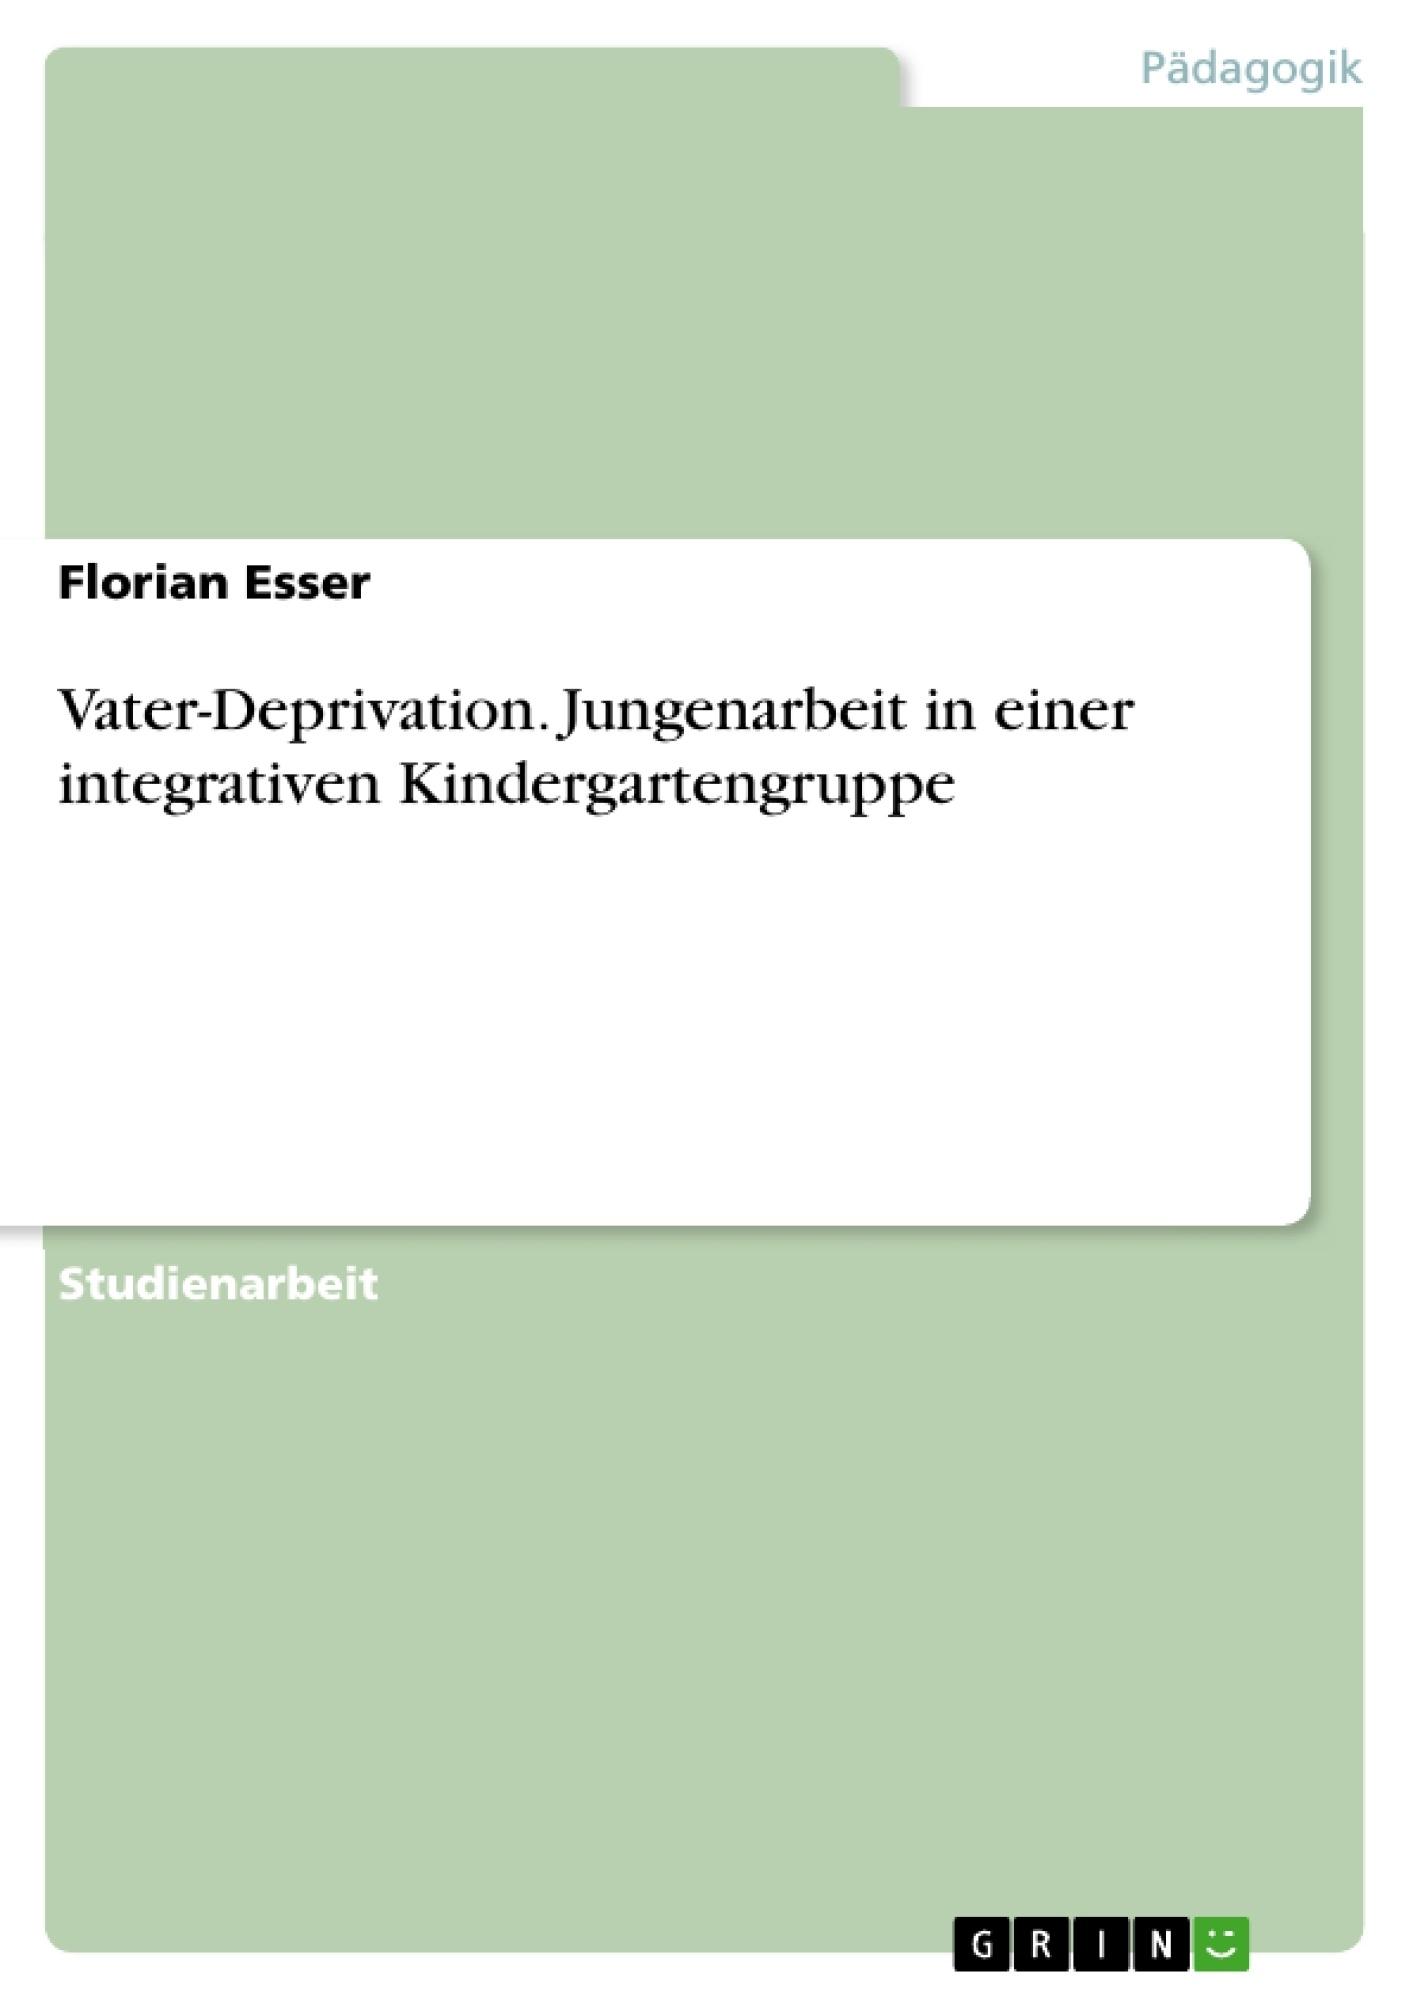 Titel: Vater-Deprivation. Jungenarbeit in einer integrativen Kindergartengruppe